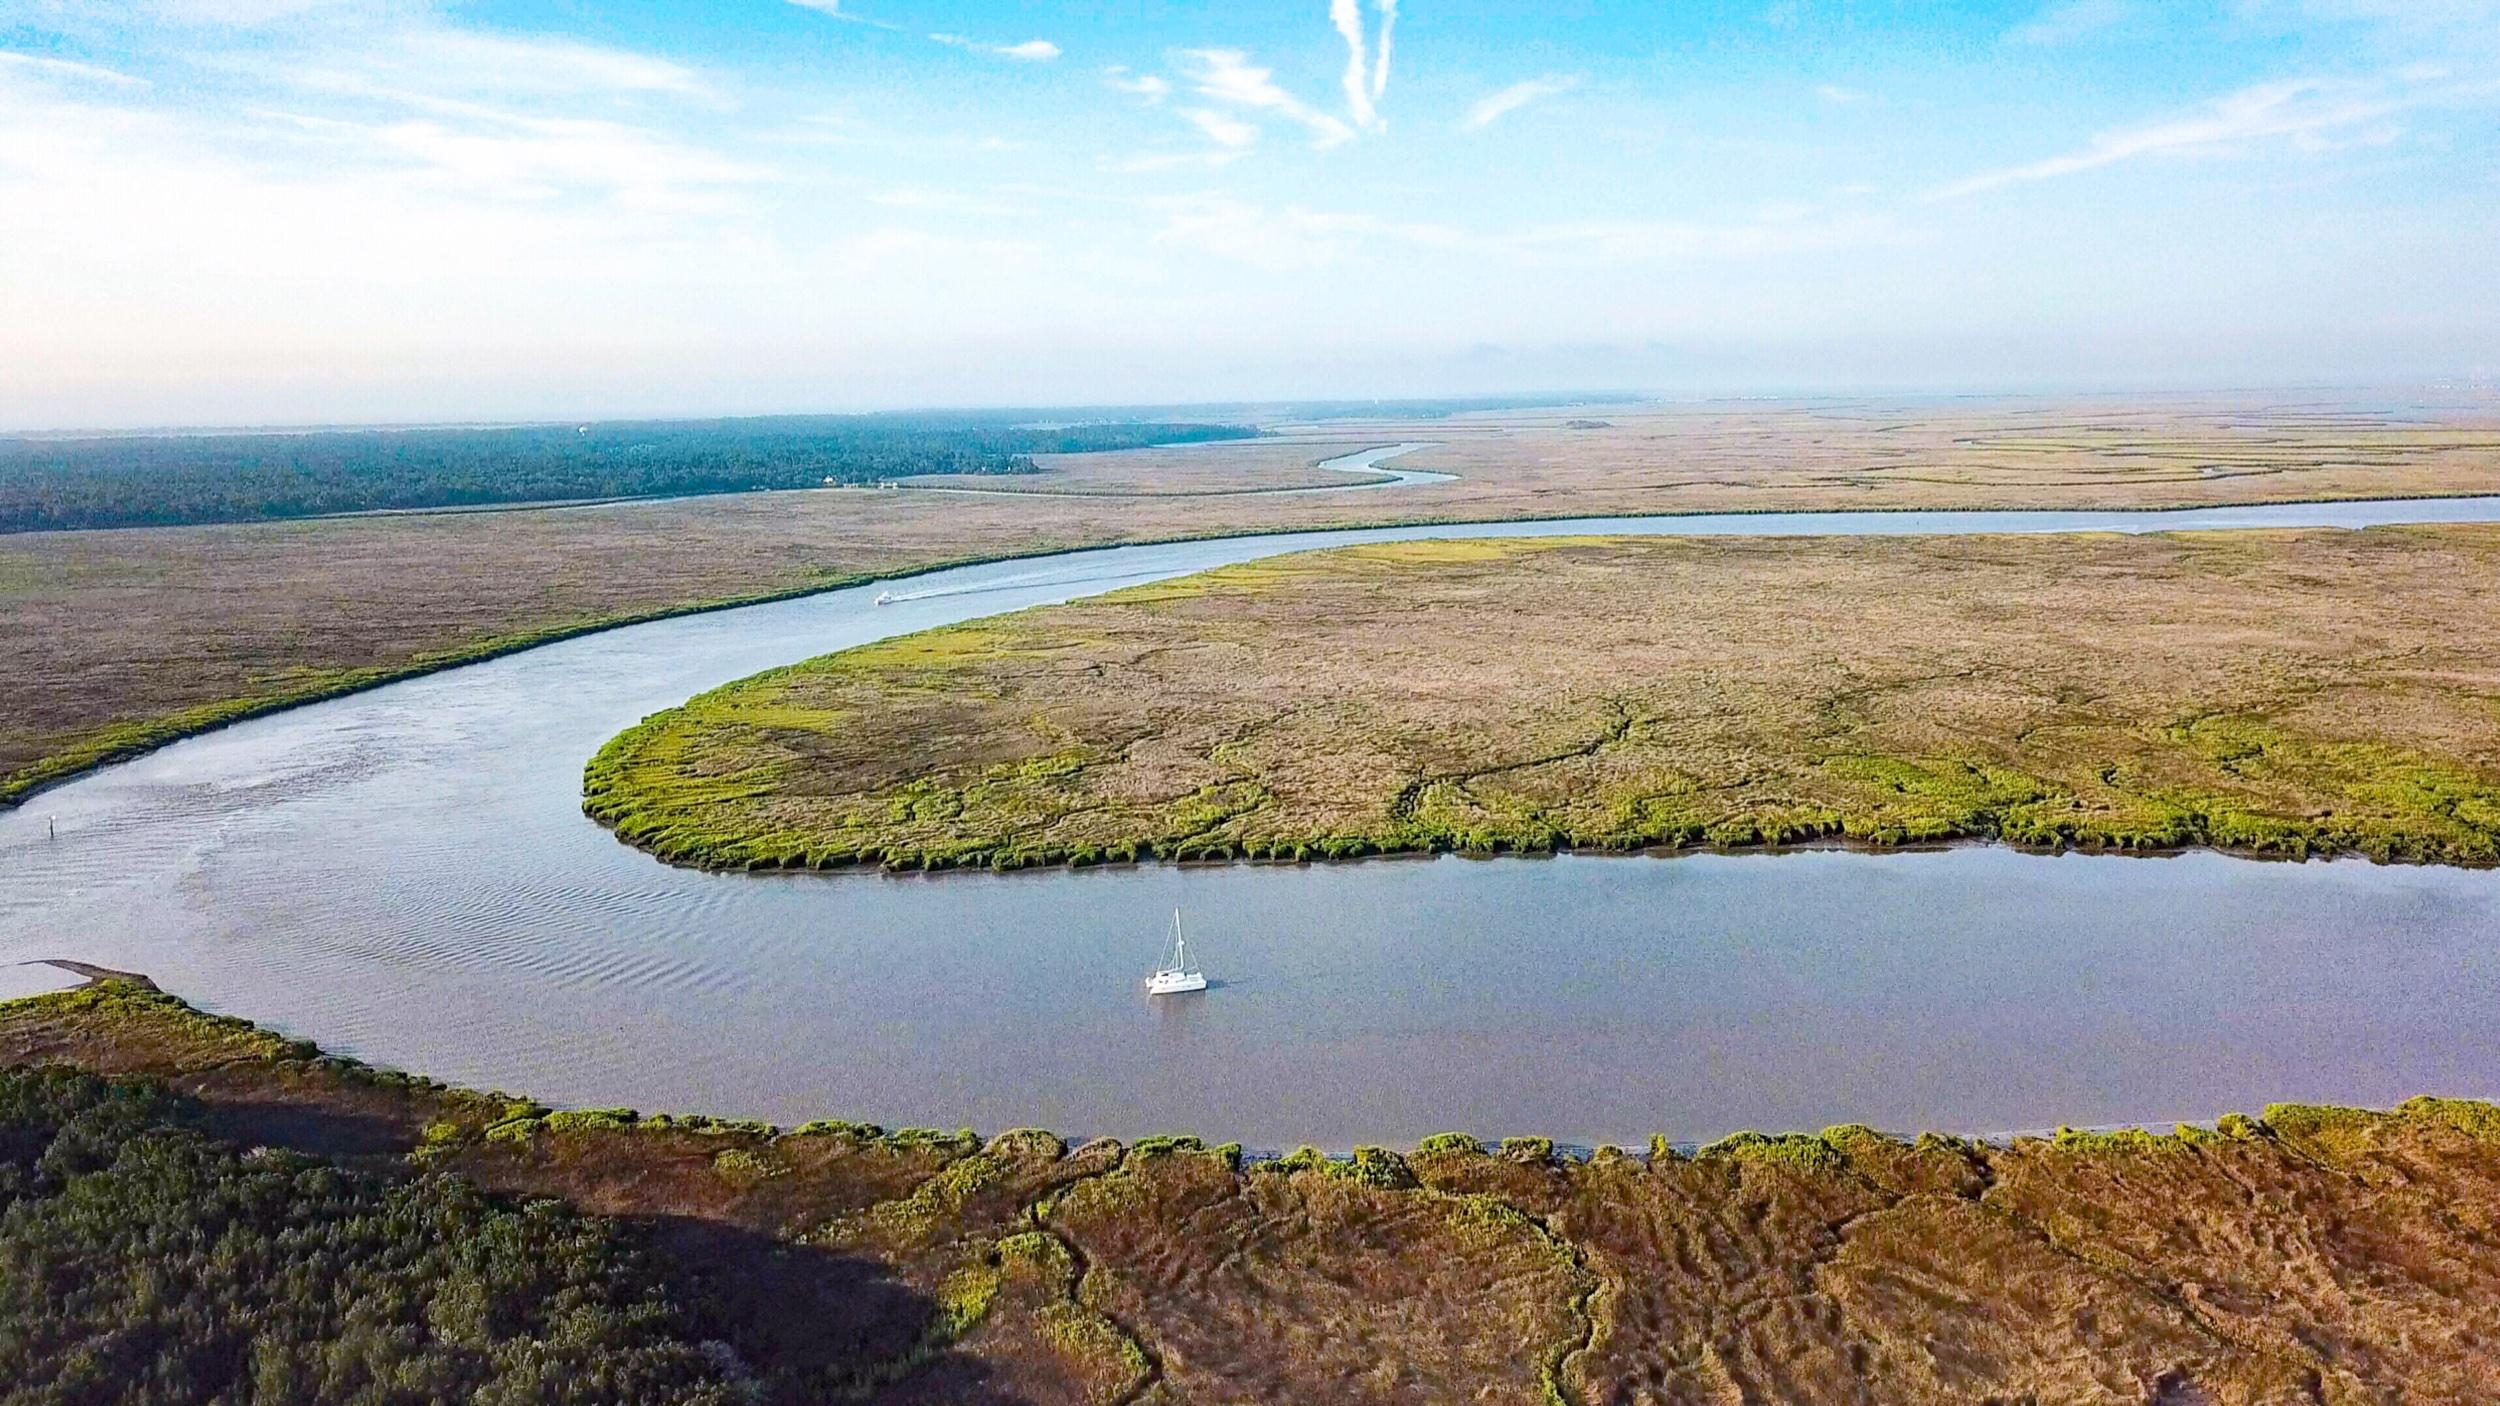 Intracoastal-Waterway-drone-photography.jpeg